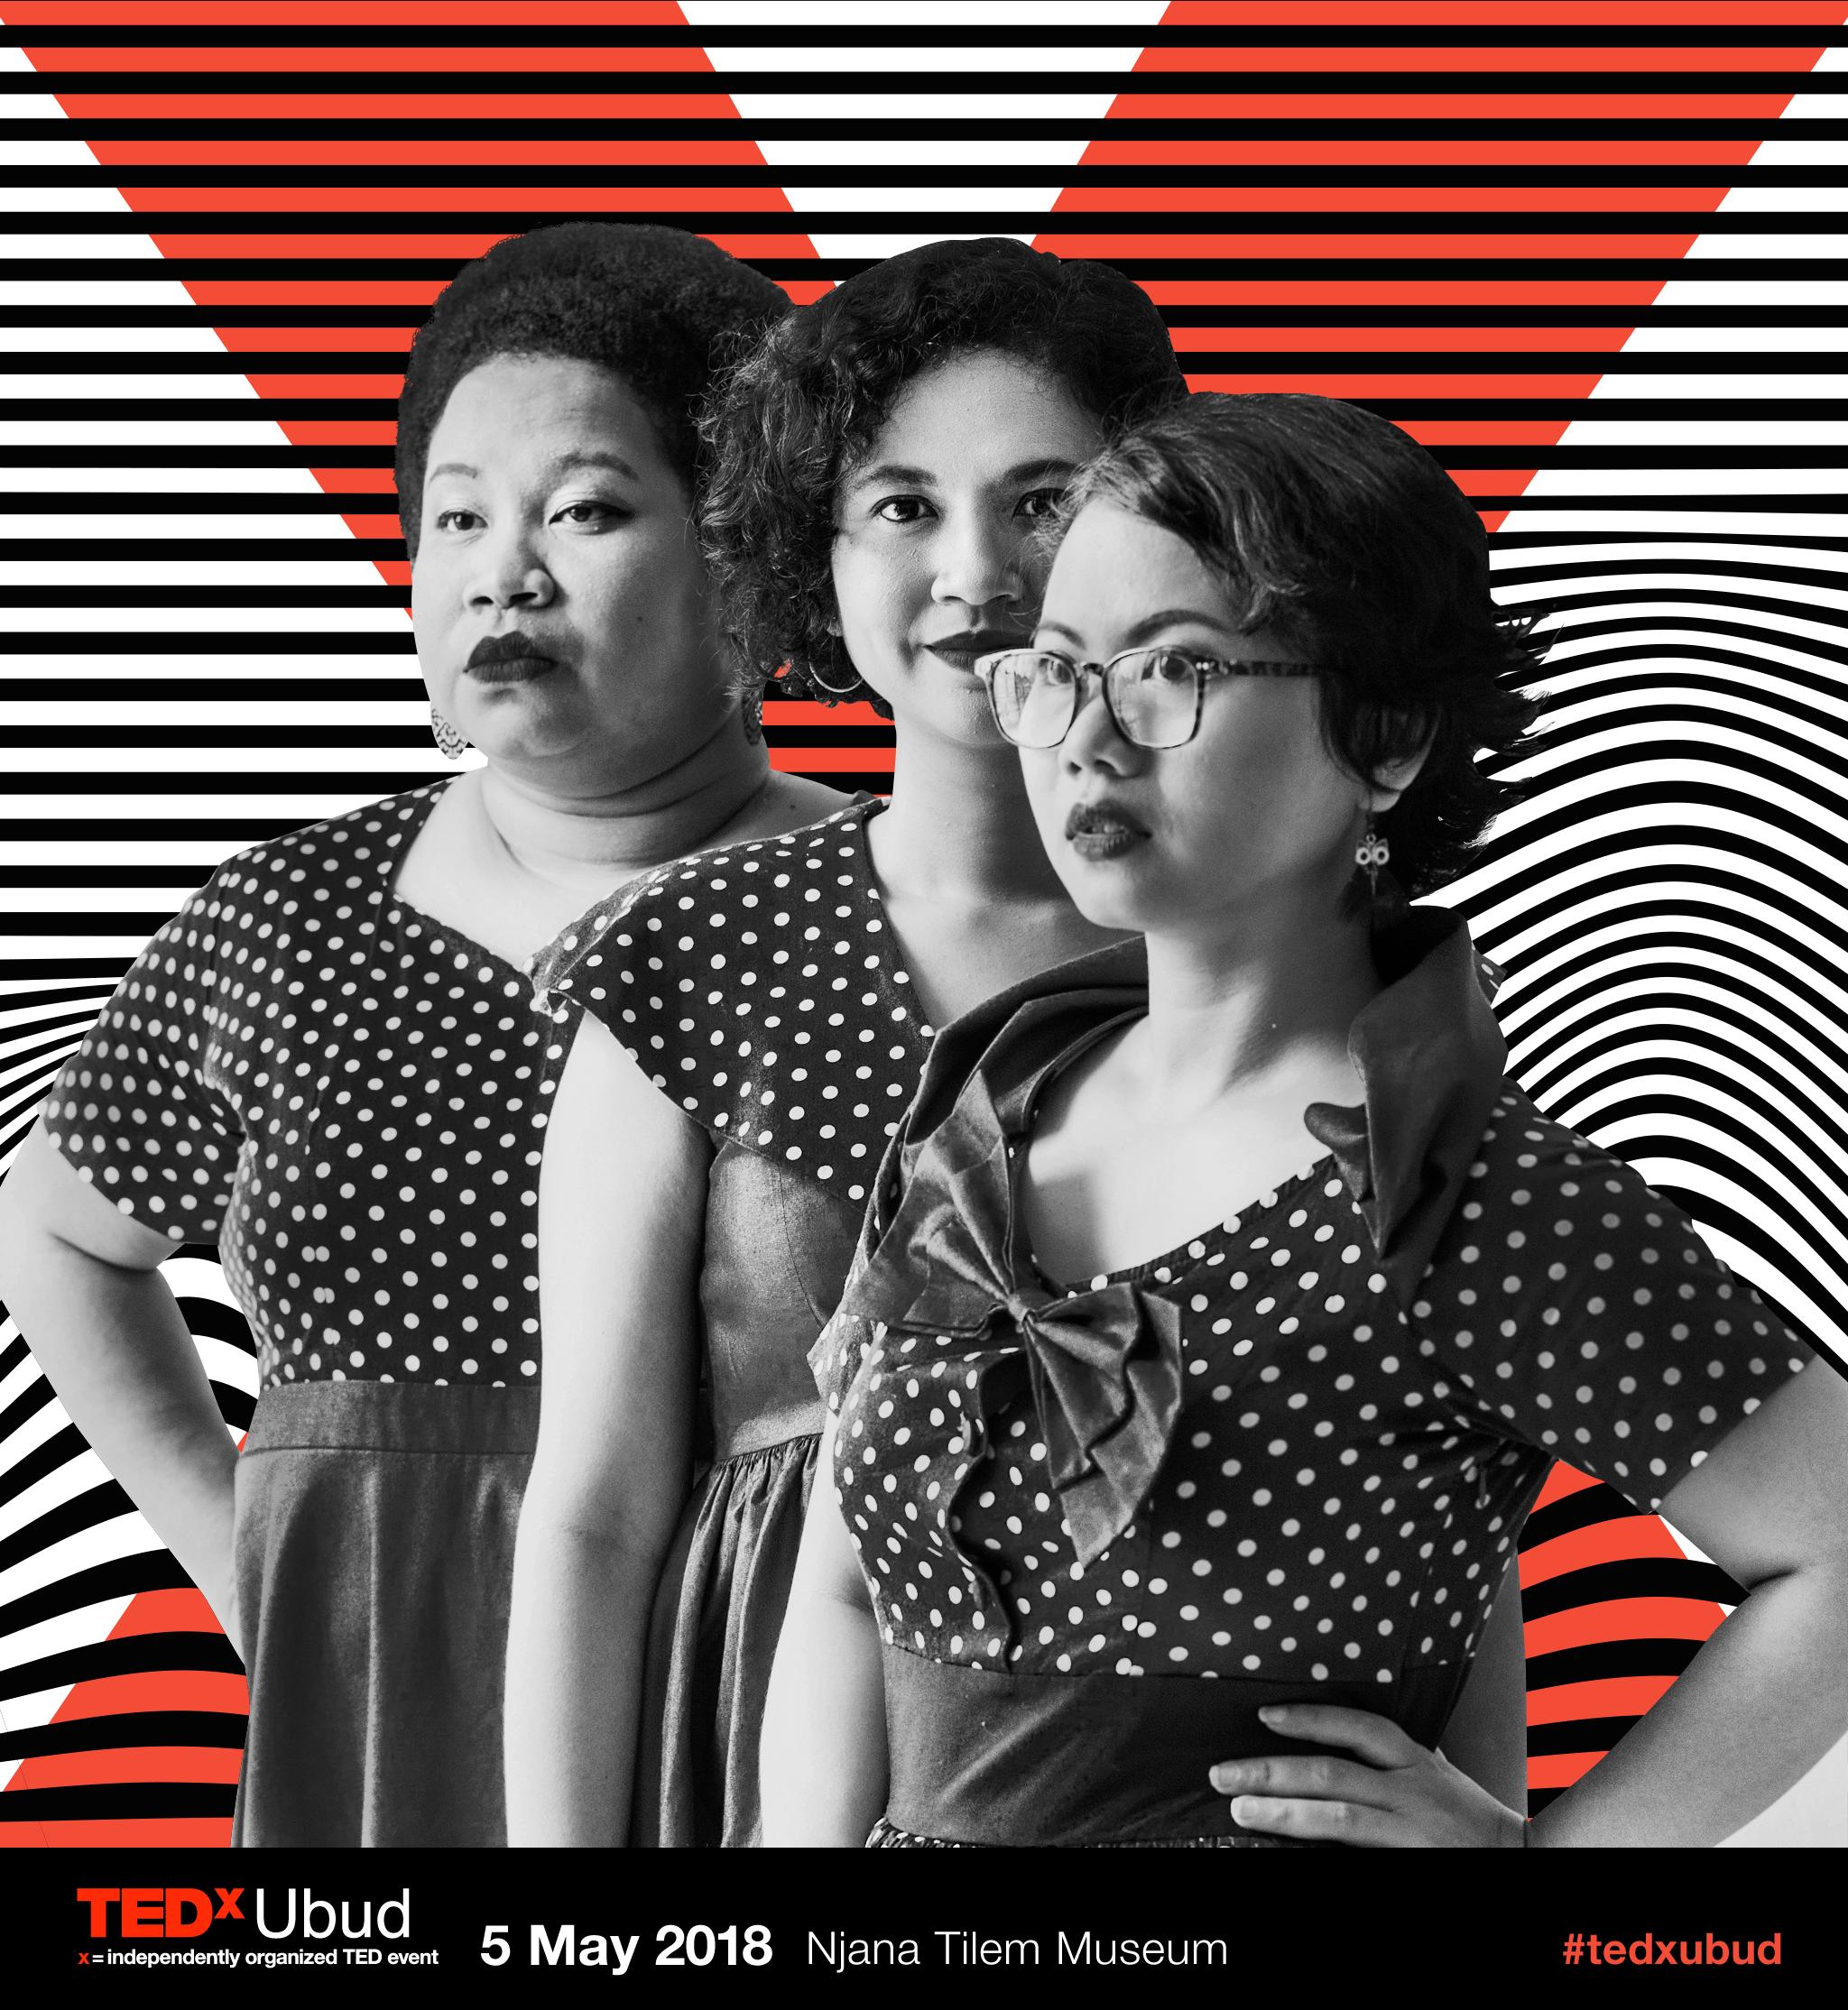 2018-NonaRia TEDxUbud-FB.png